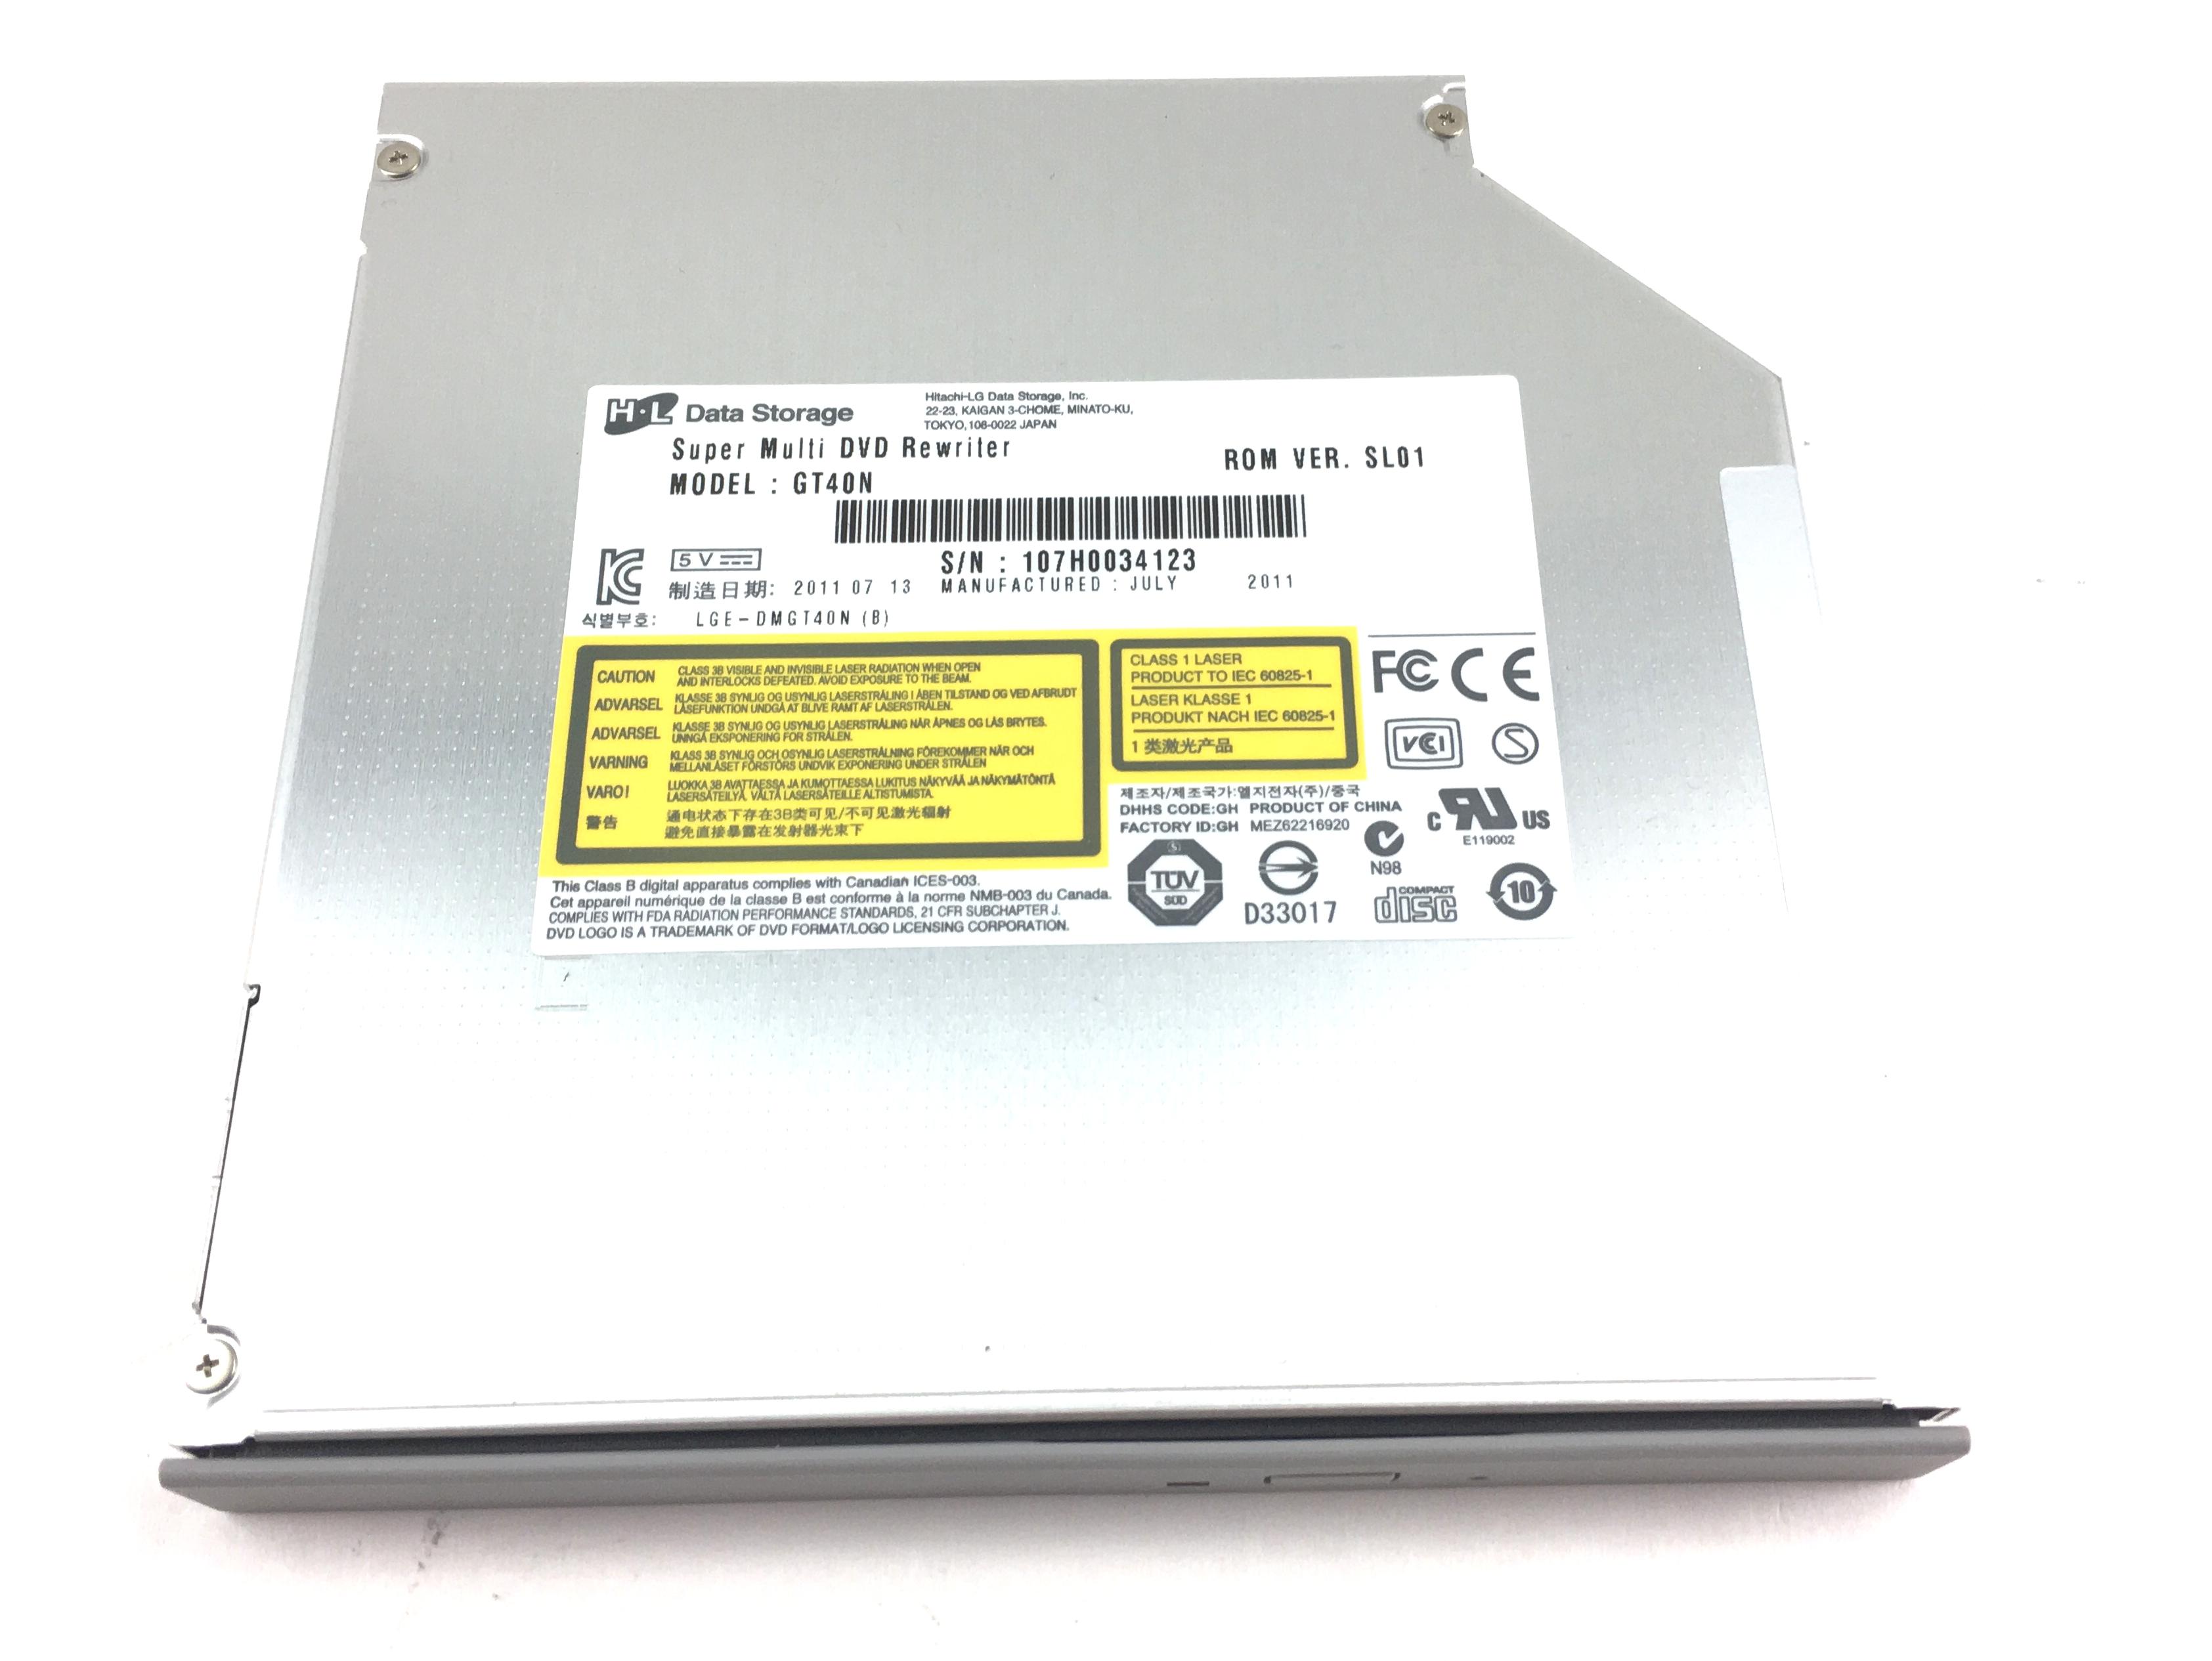 HItachi LG Super Multi DVD Rewriter LGE-DMGT40N (GT40N)